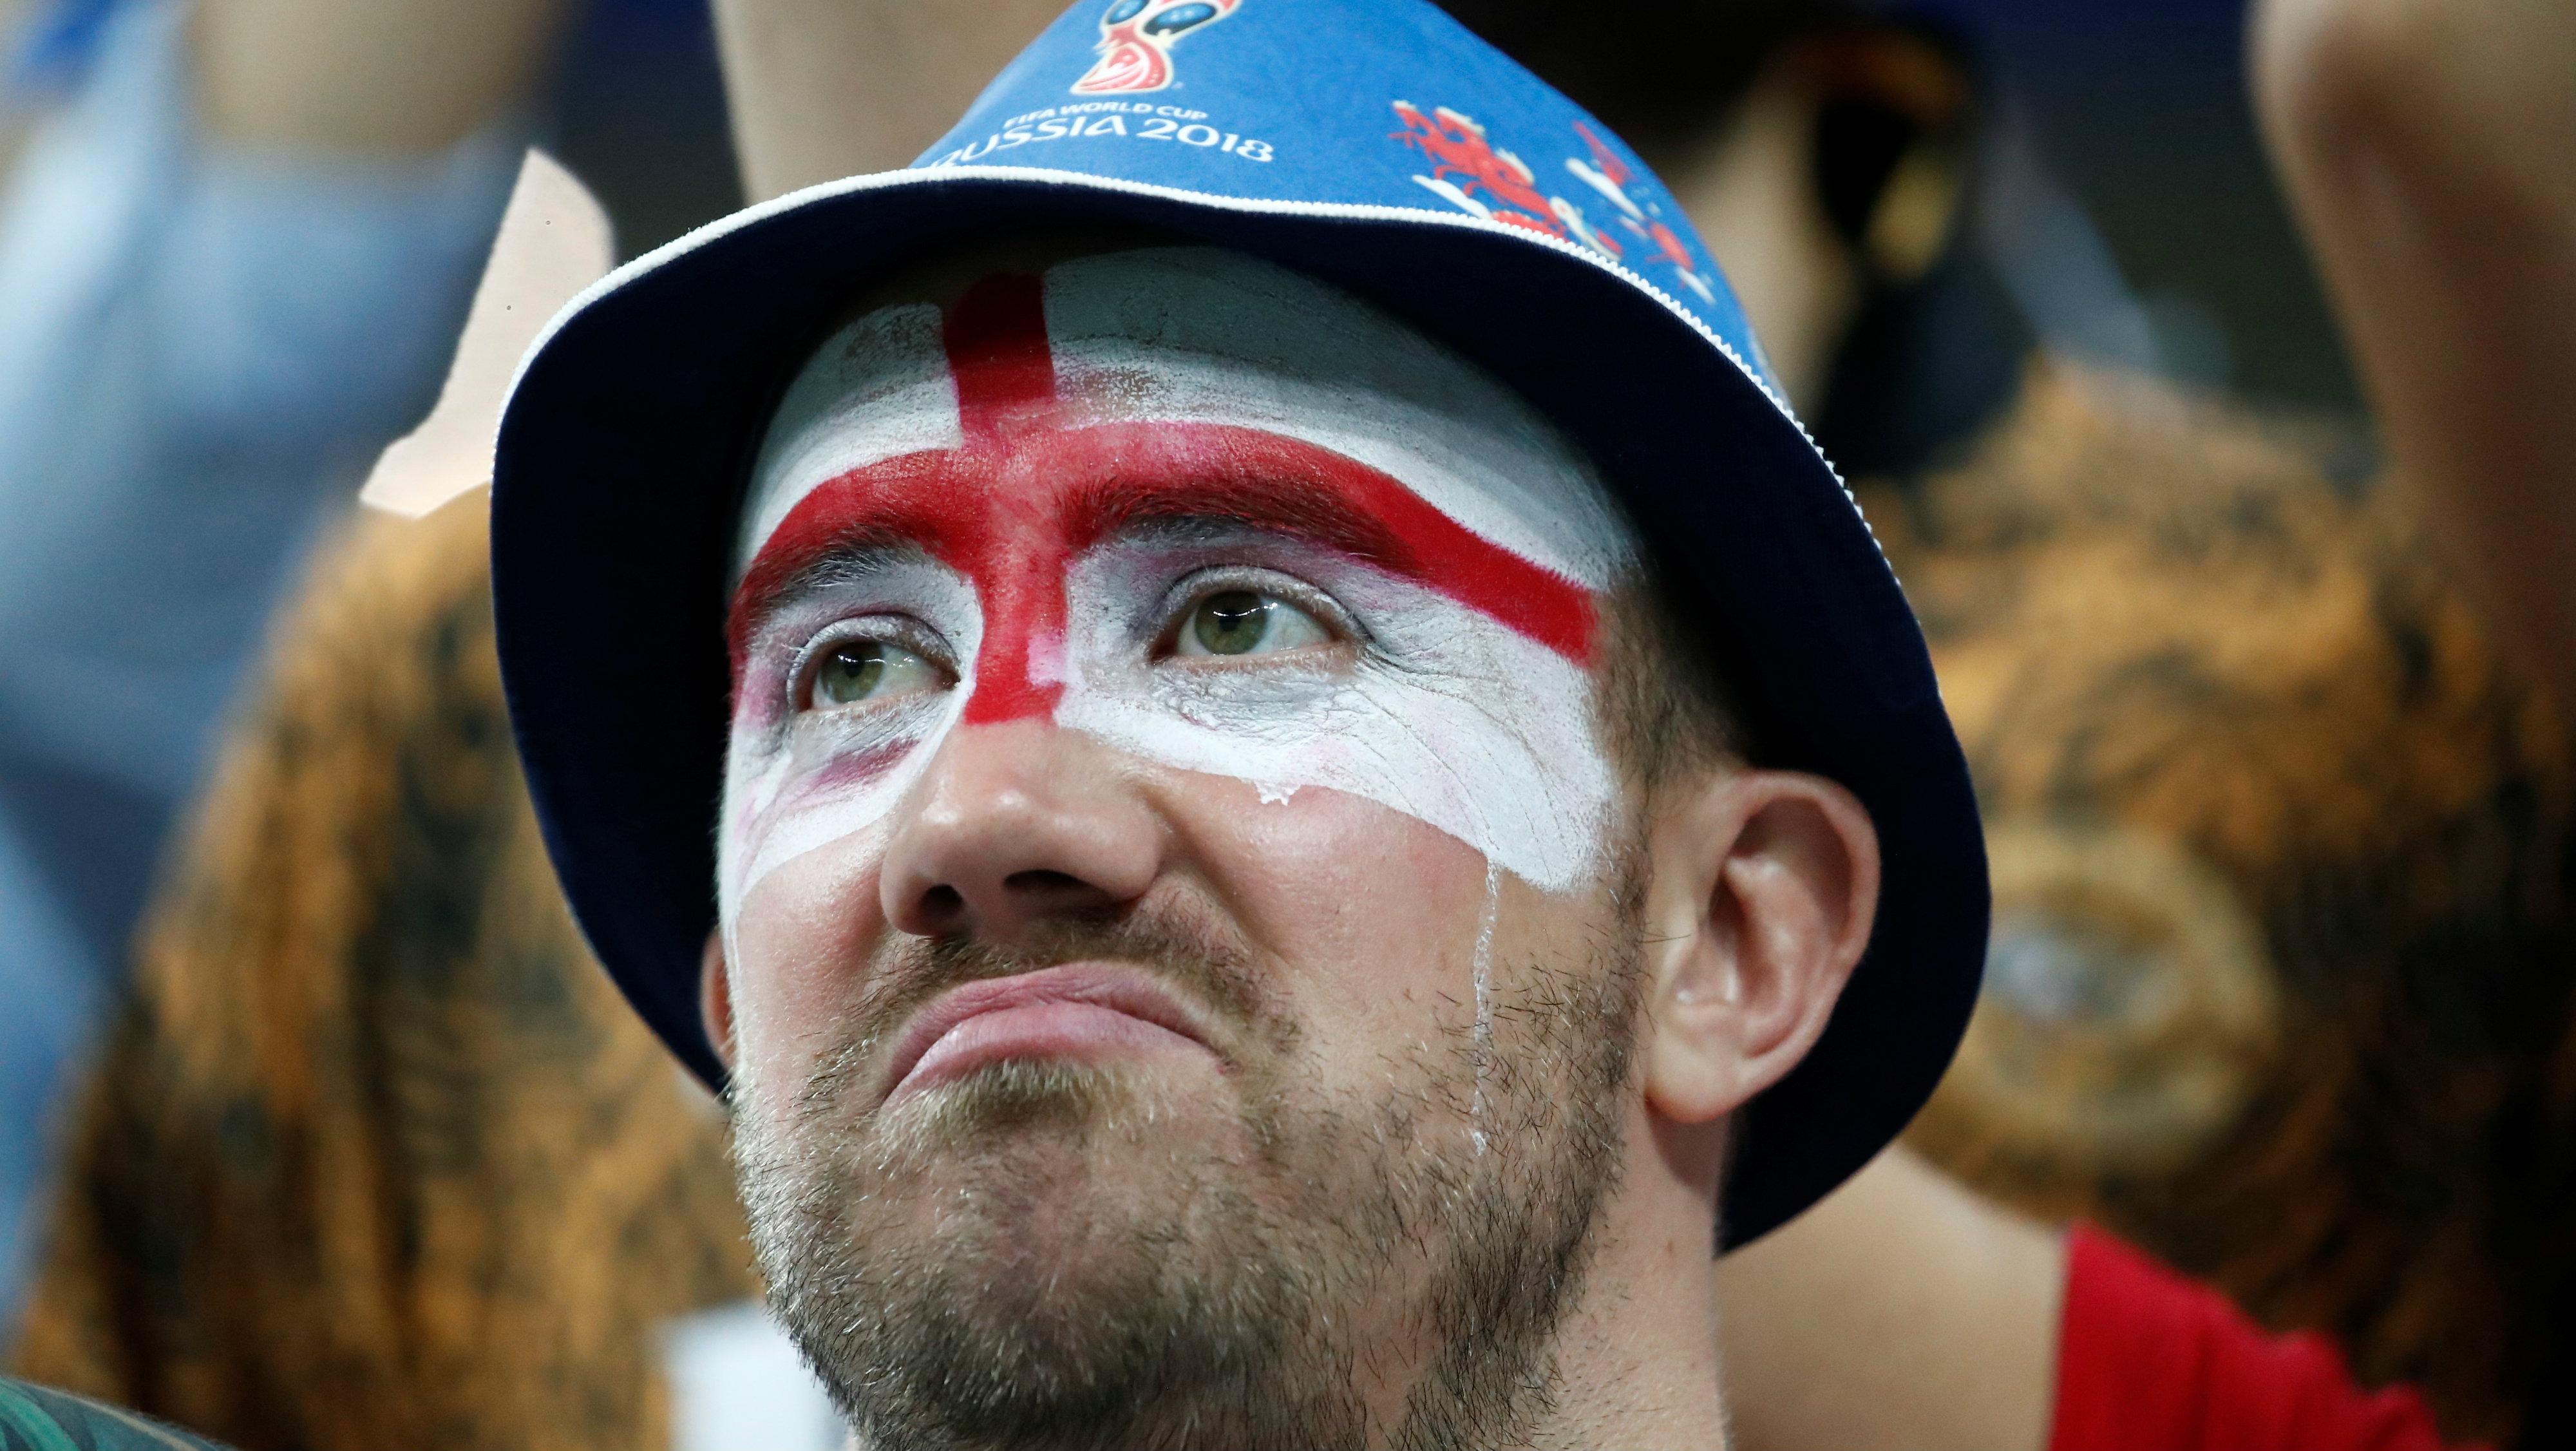 A sad English football fan